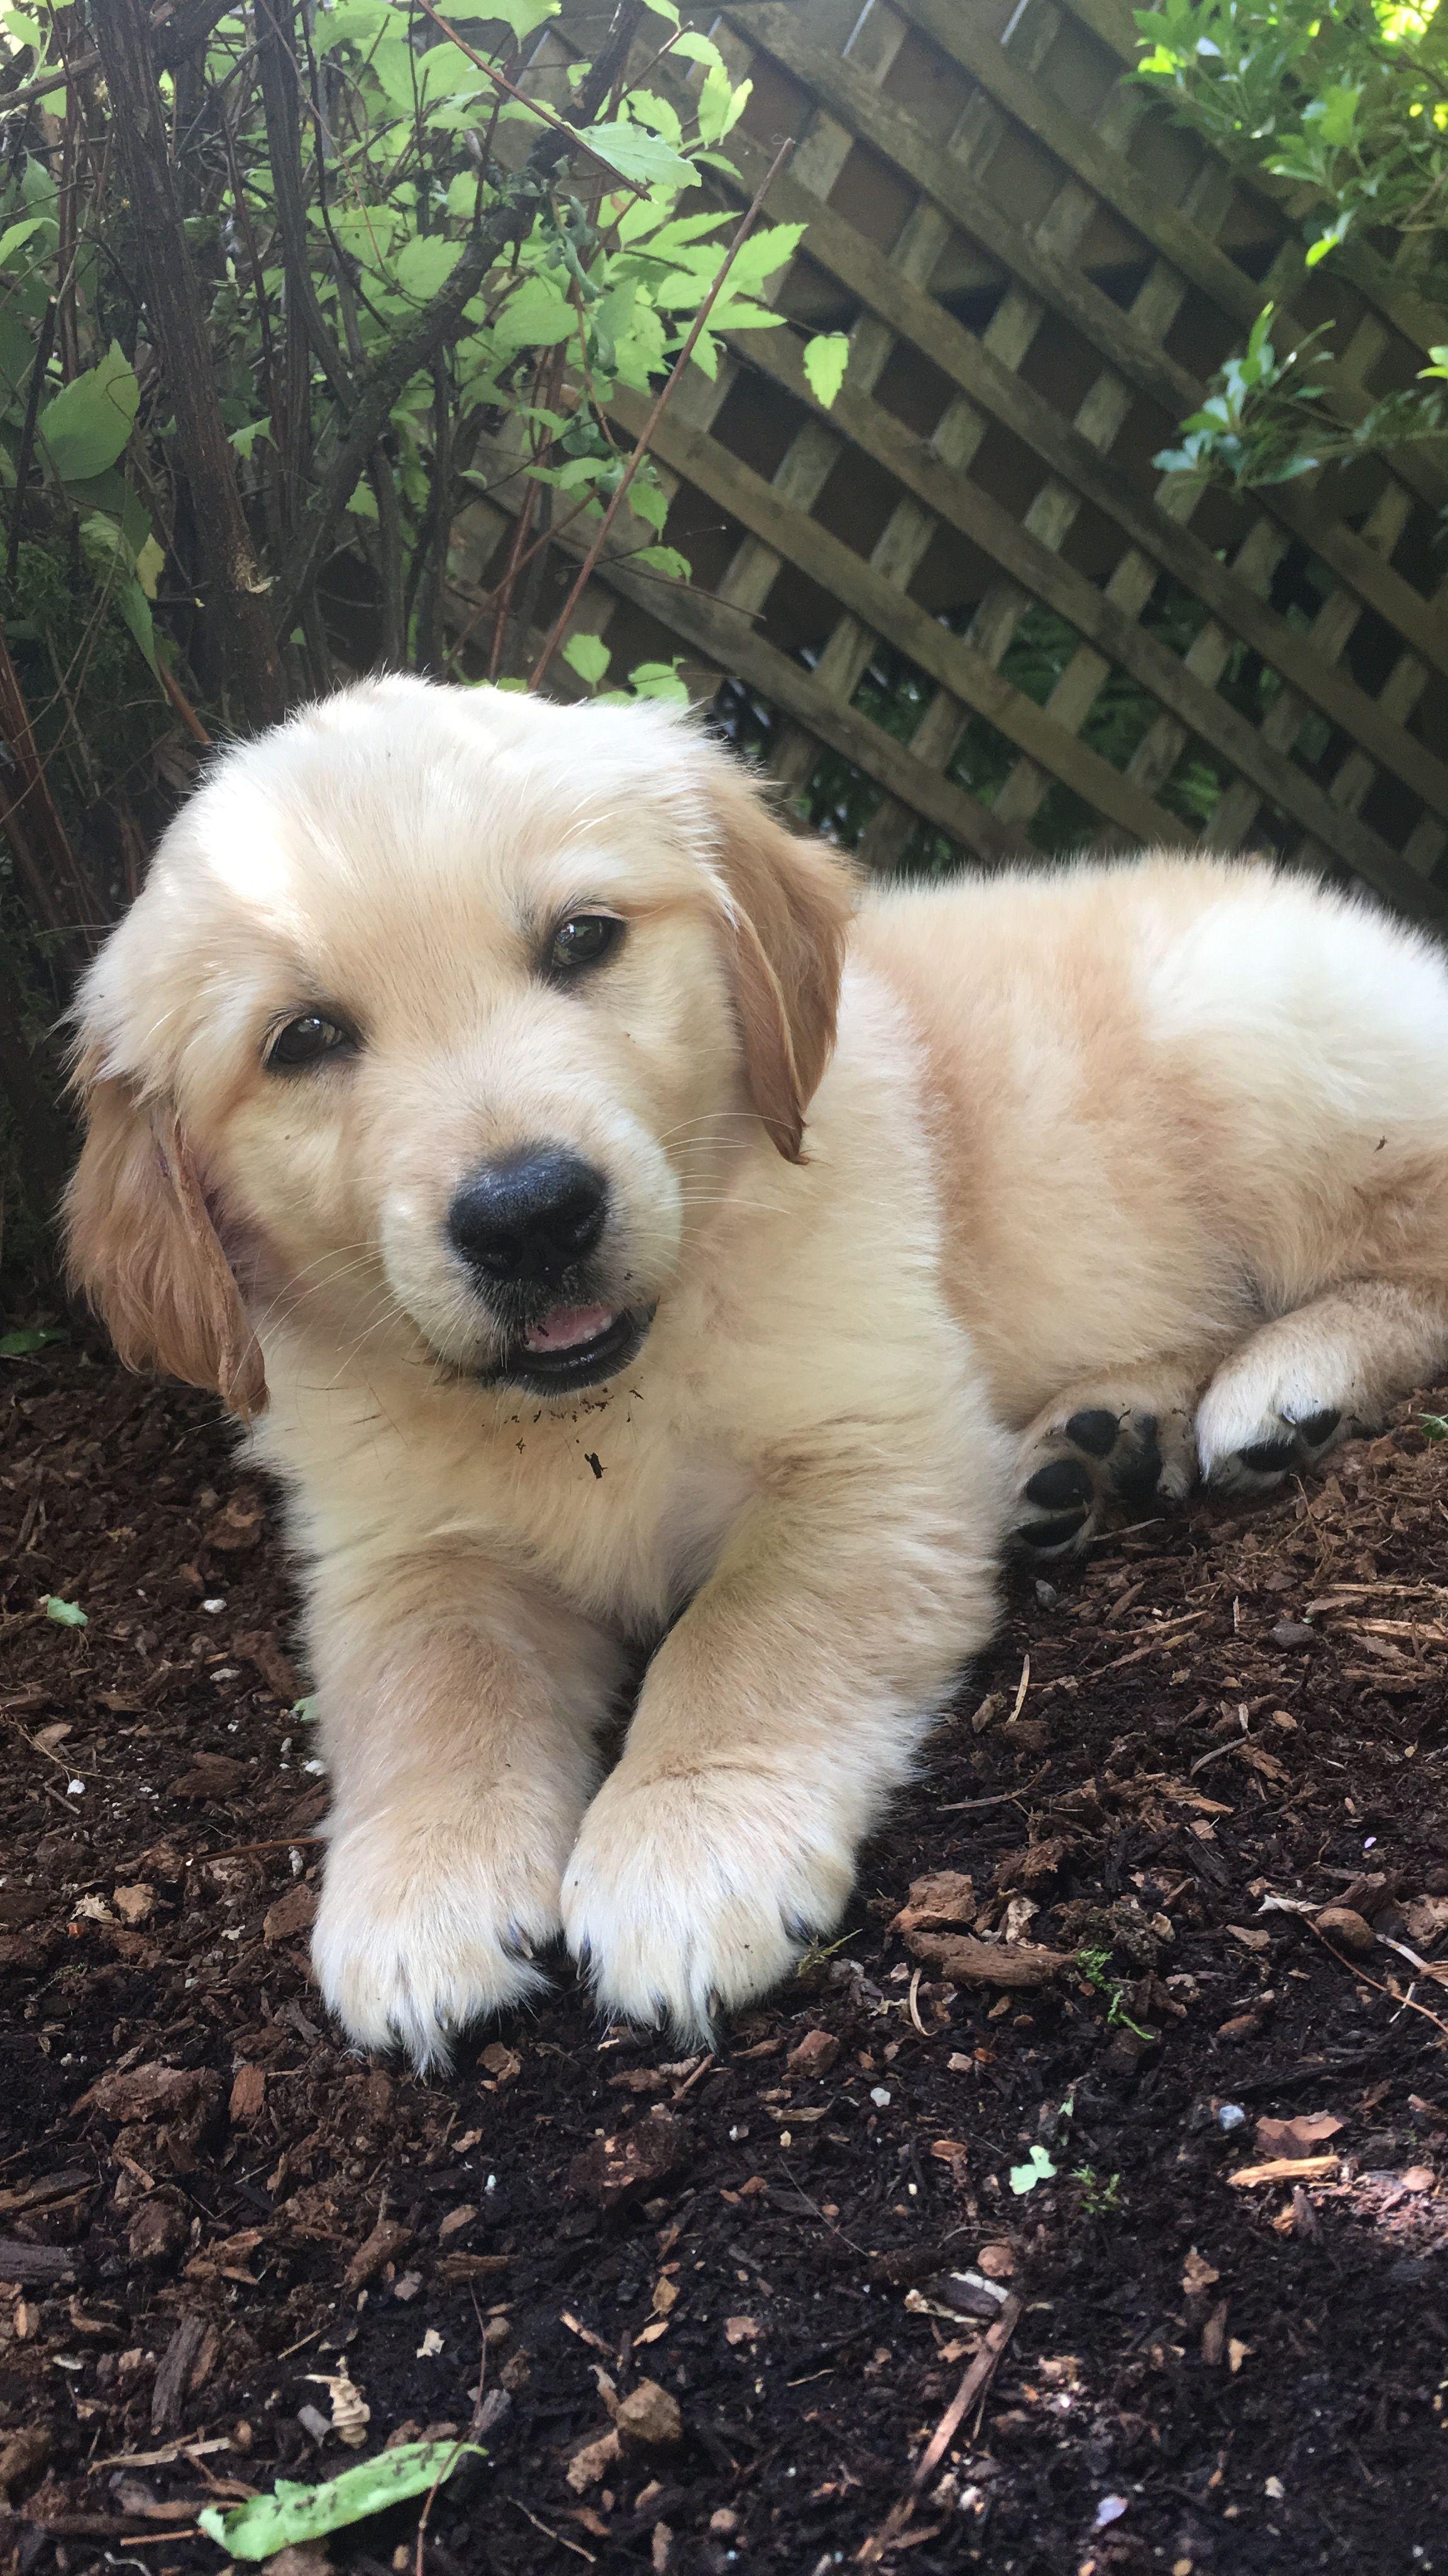 Golden Retriever Puppy Cute Dog Little Baby Retriever Puppy